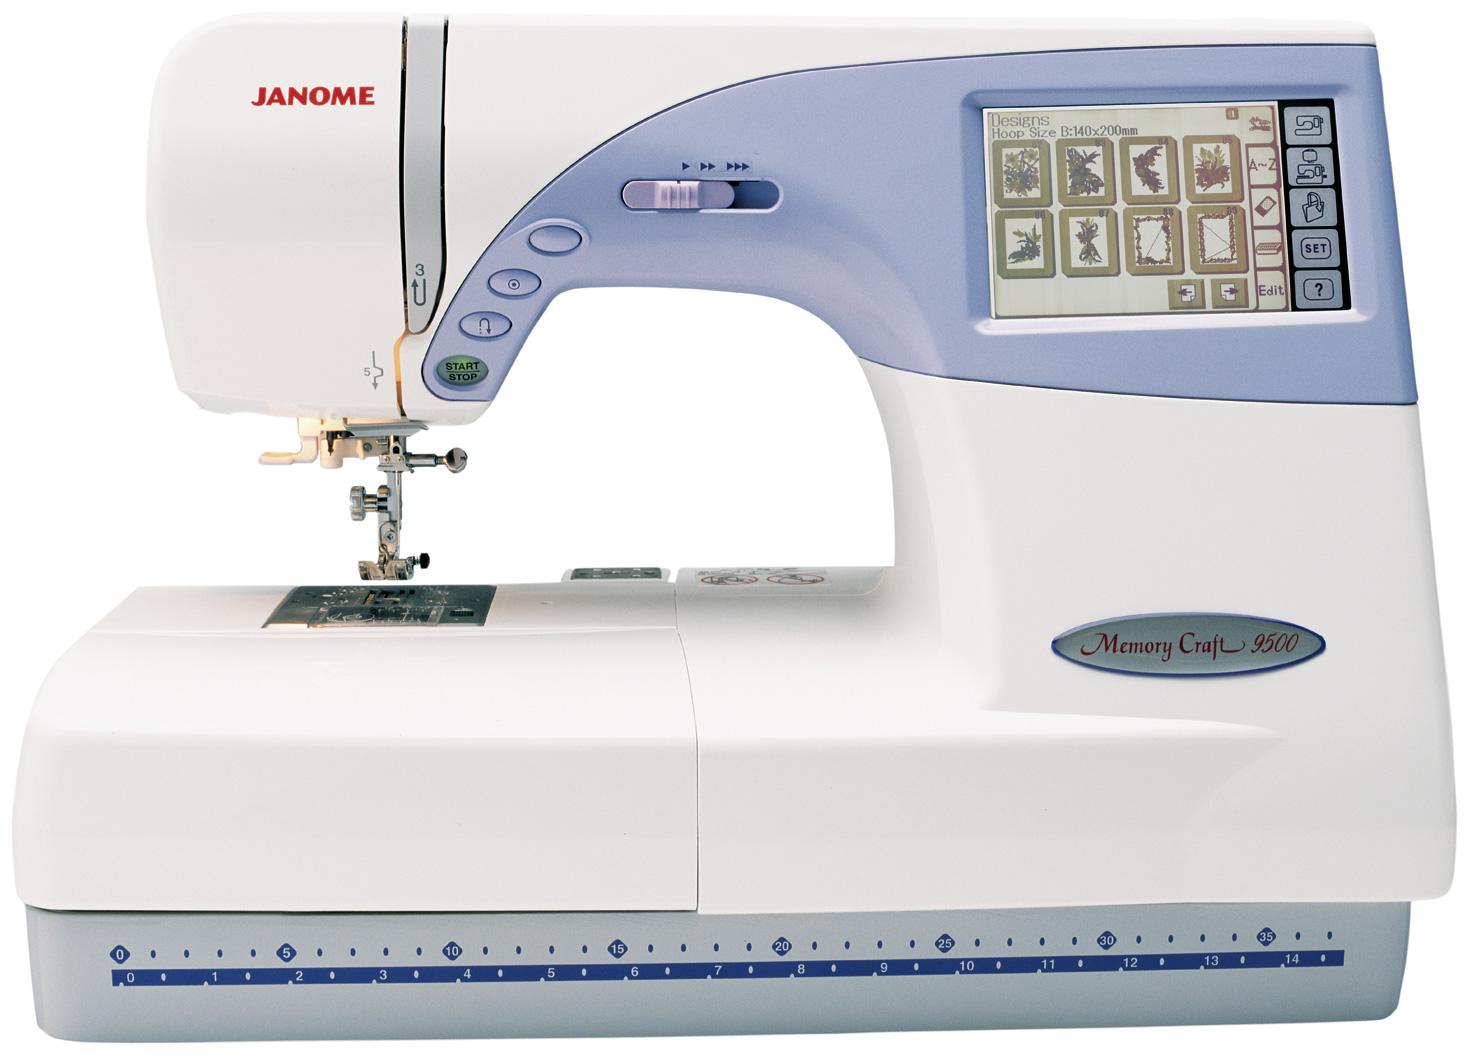 Janome Memory Craft MC 9500